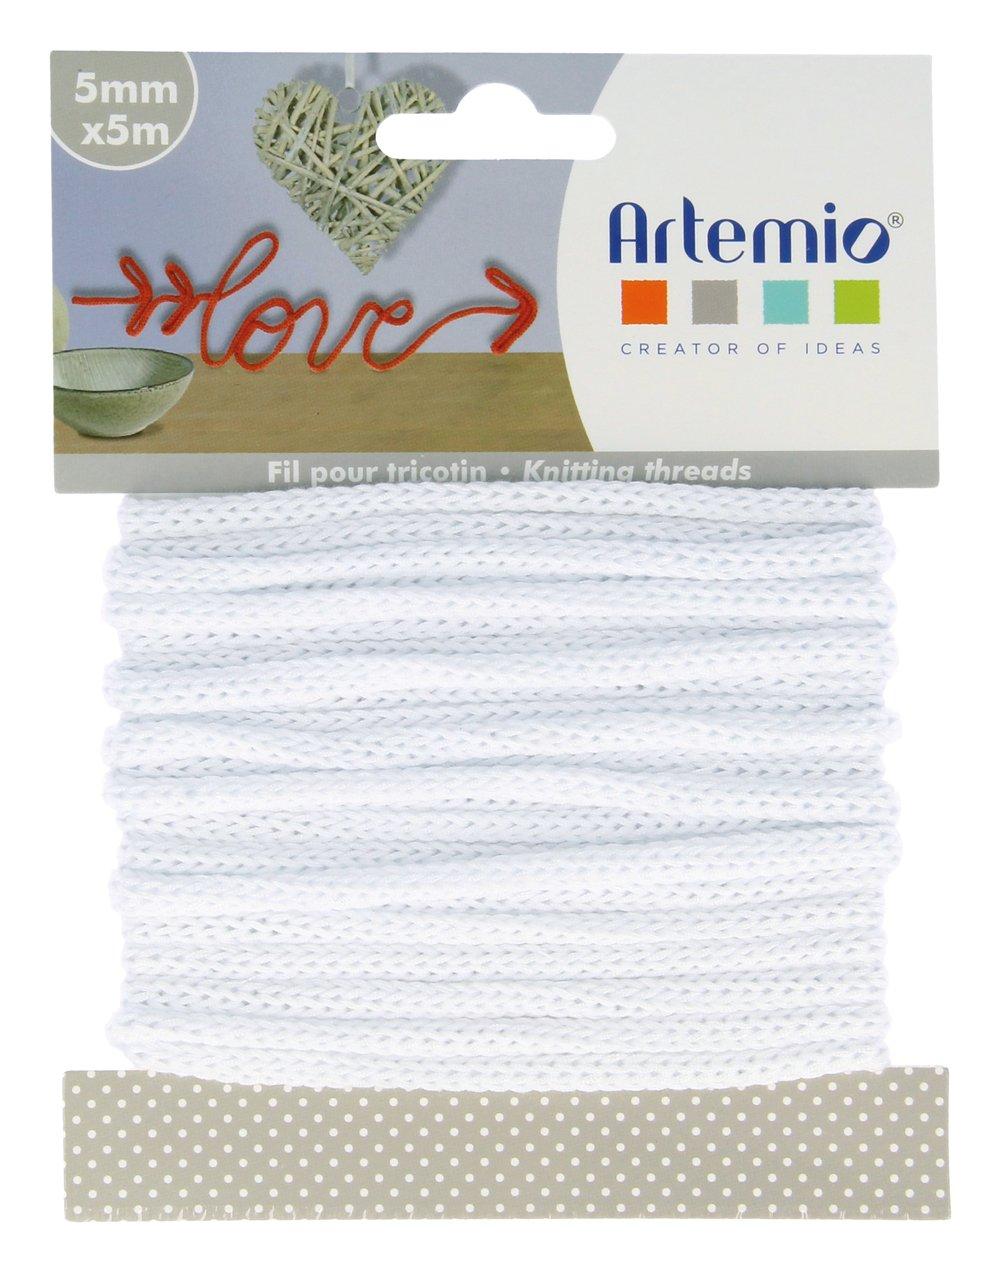 Ficelle Blanche 5mm 5 M/ètres Fil tricotin Blanc